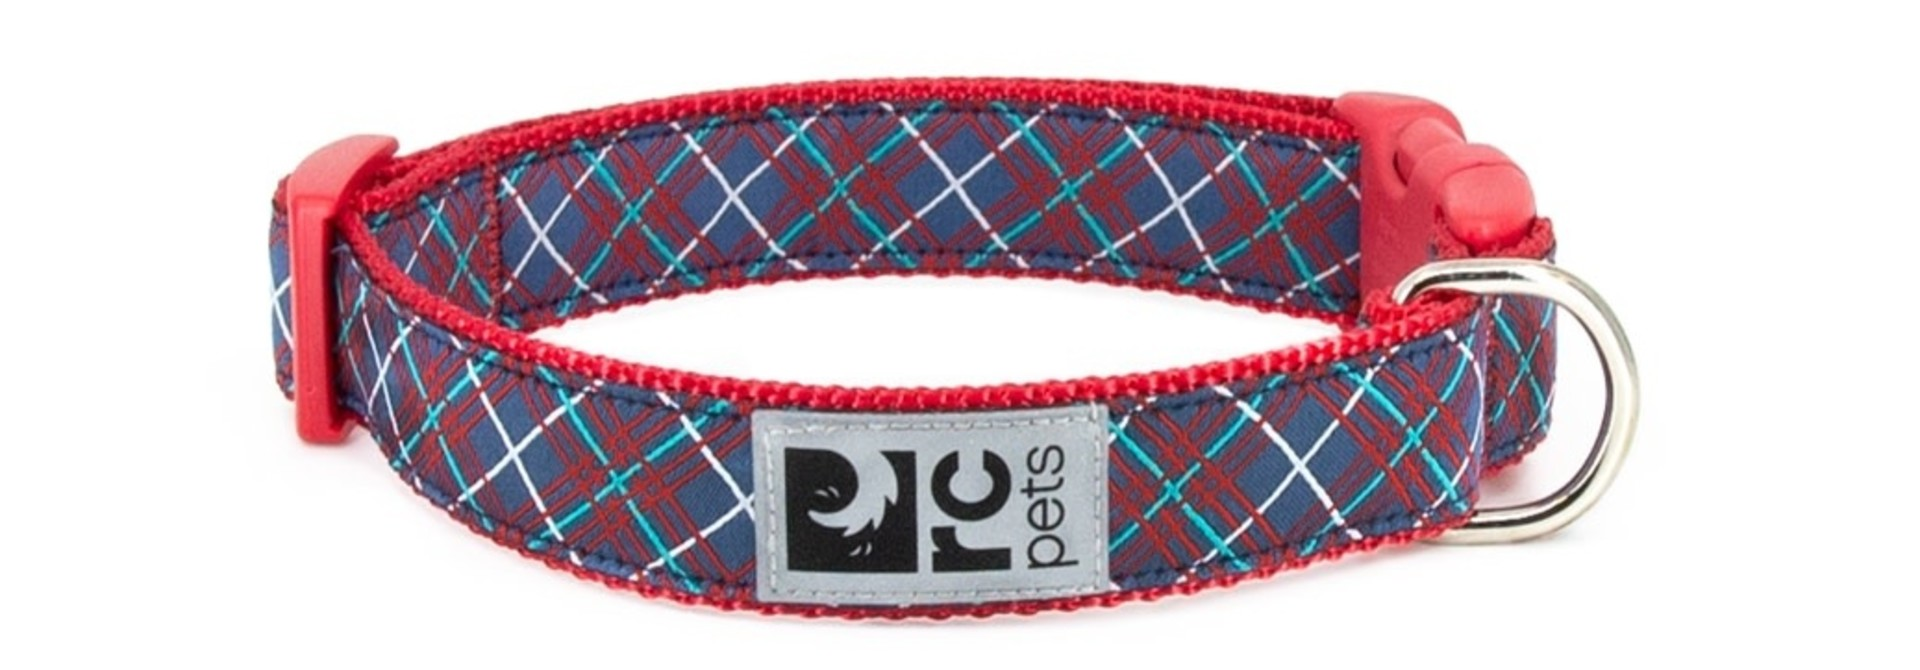 Clip Collar - Navy Tartan